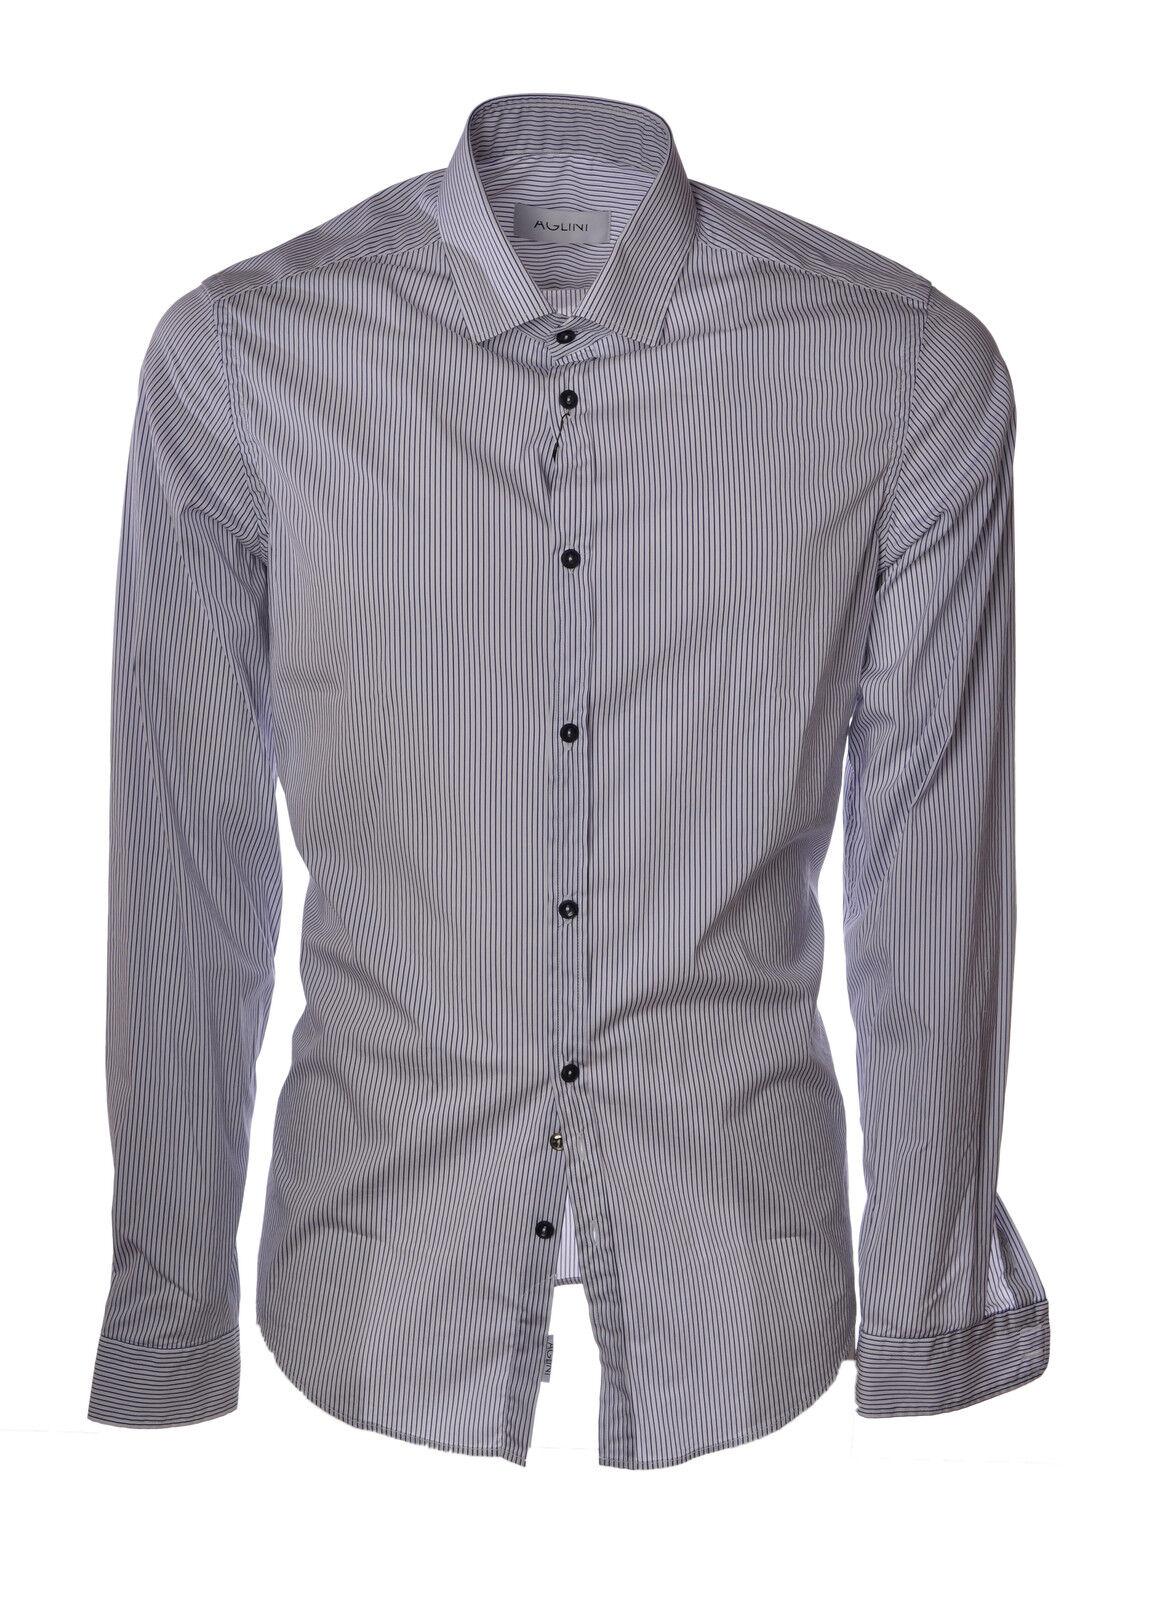 Aglini - Shirts-Shirt - Man - Fantasy - 3179908L184315